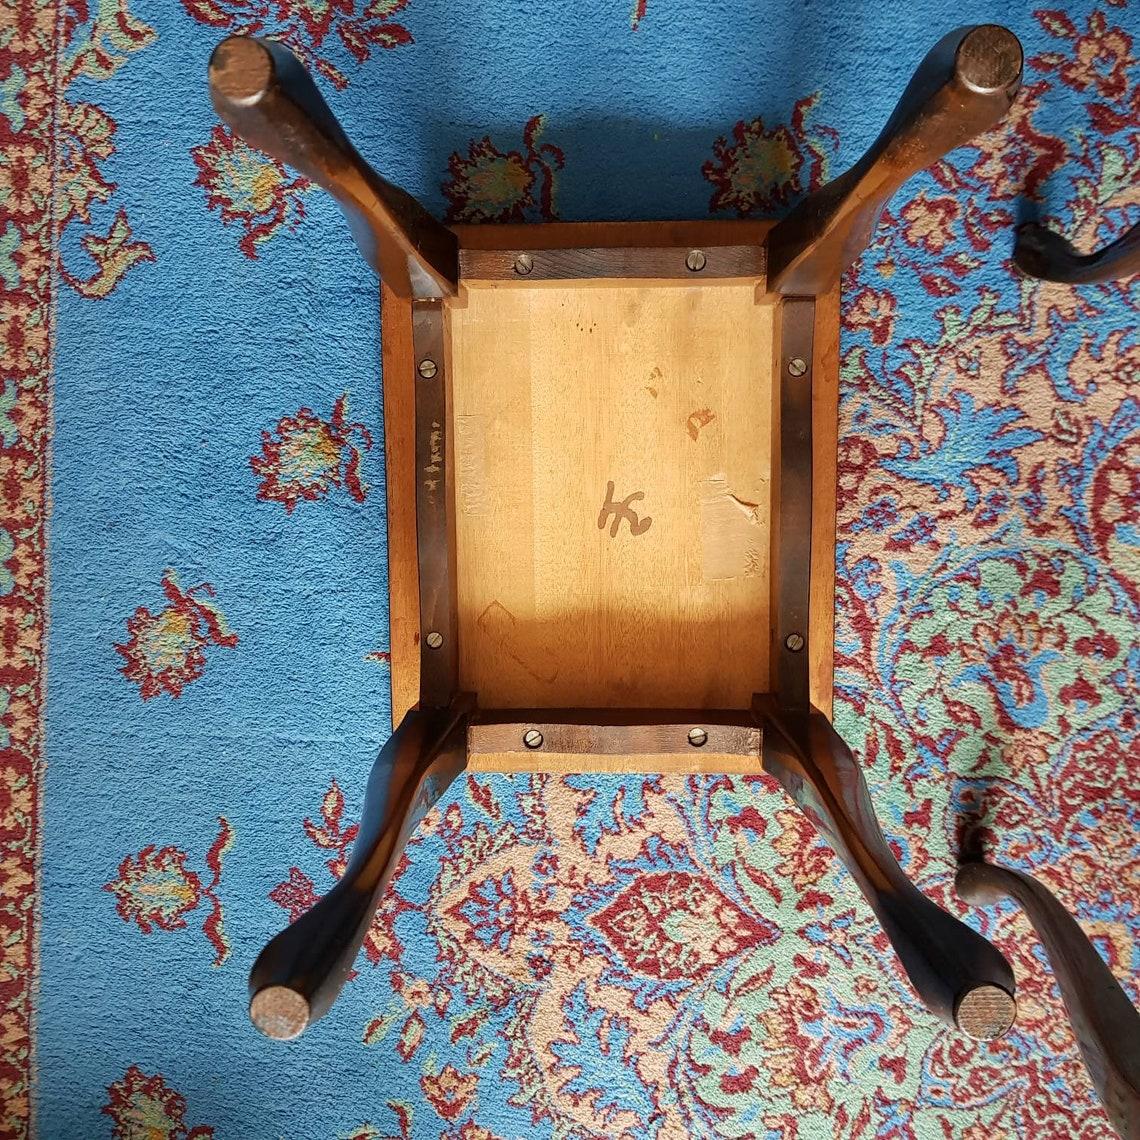 Vintage oak tables set of 3 coffee tables home decor home living room furniture retro nest tables interior design.